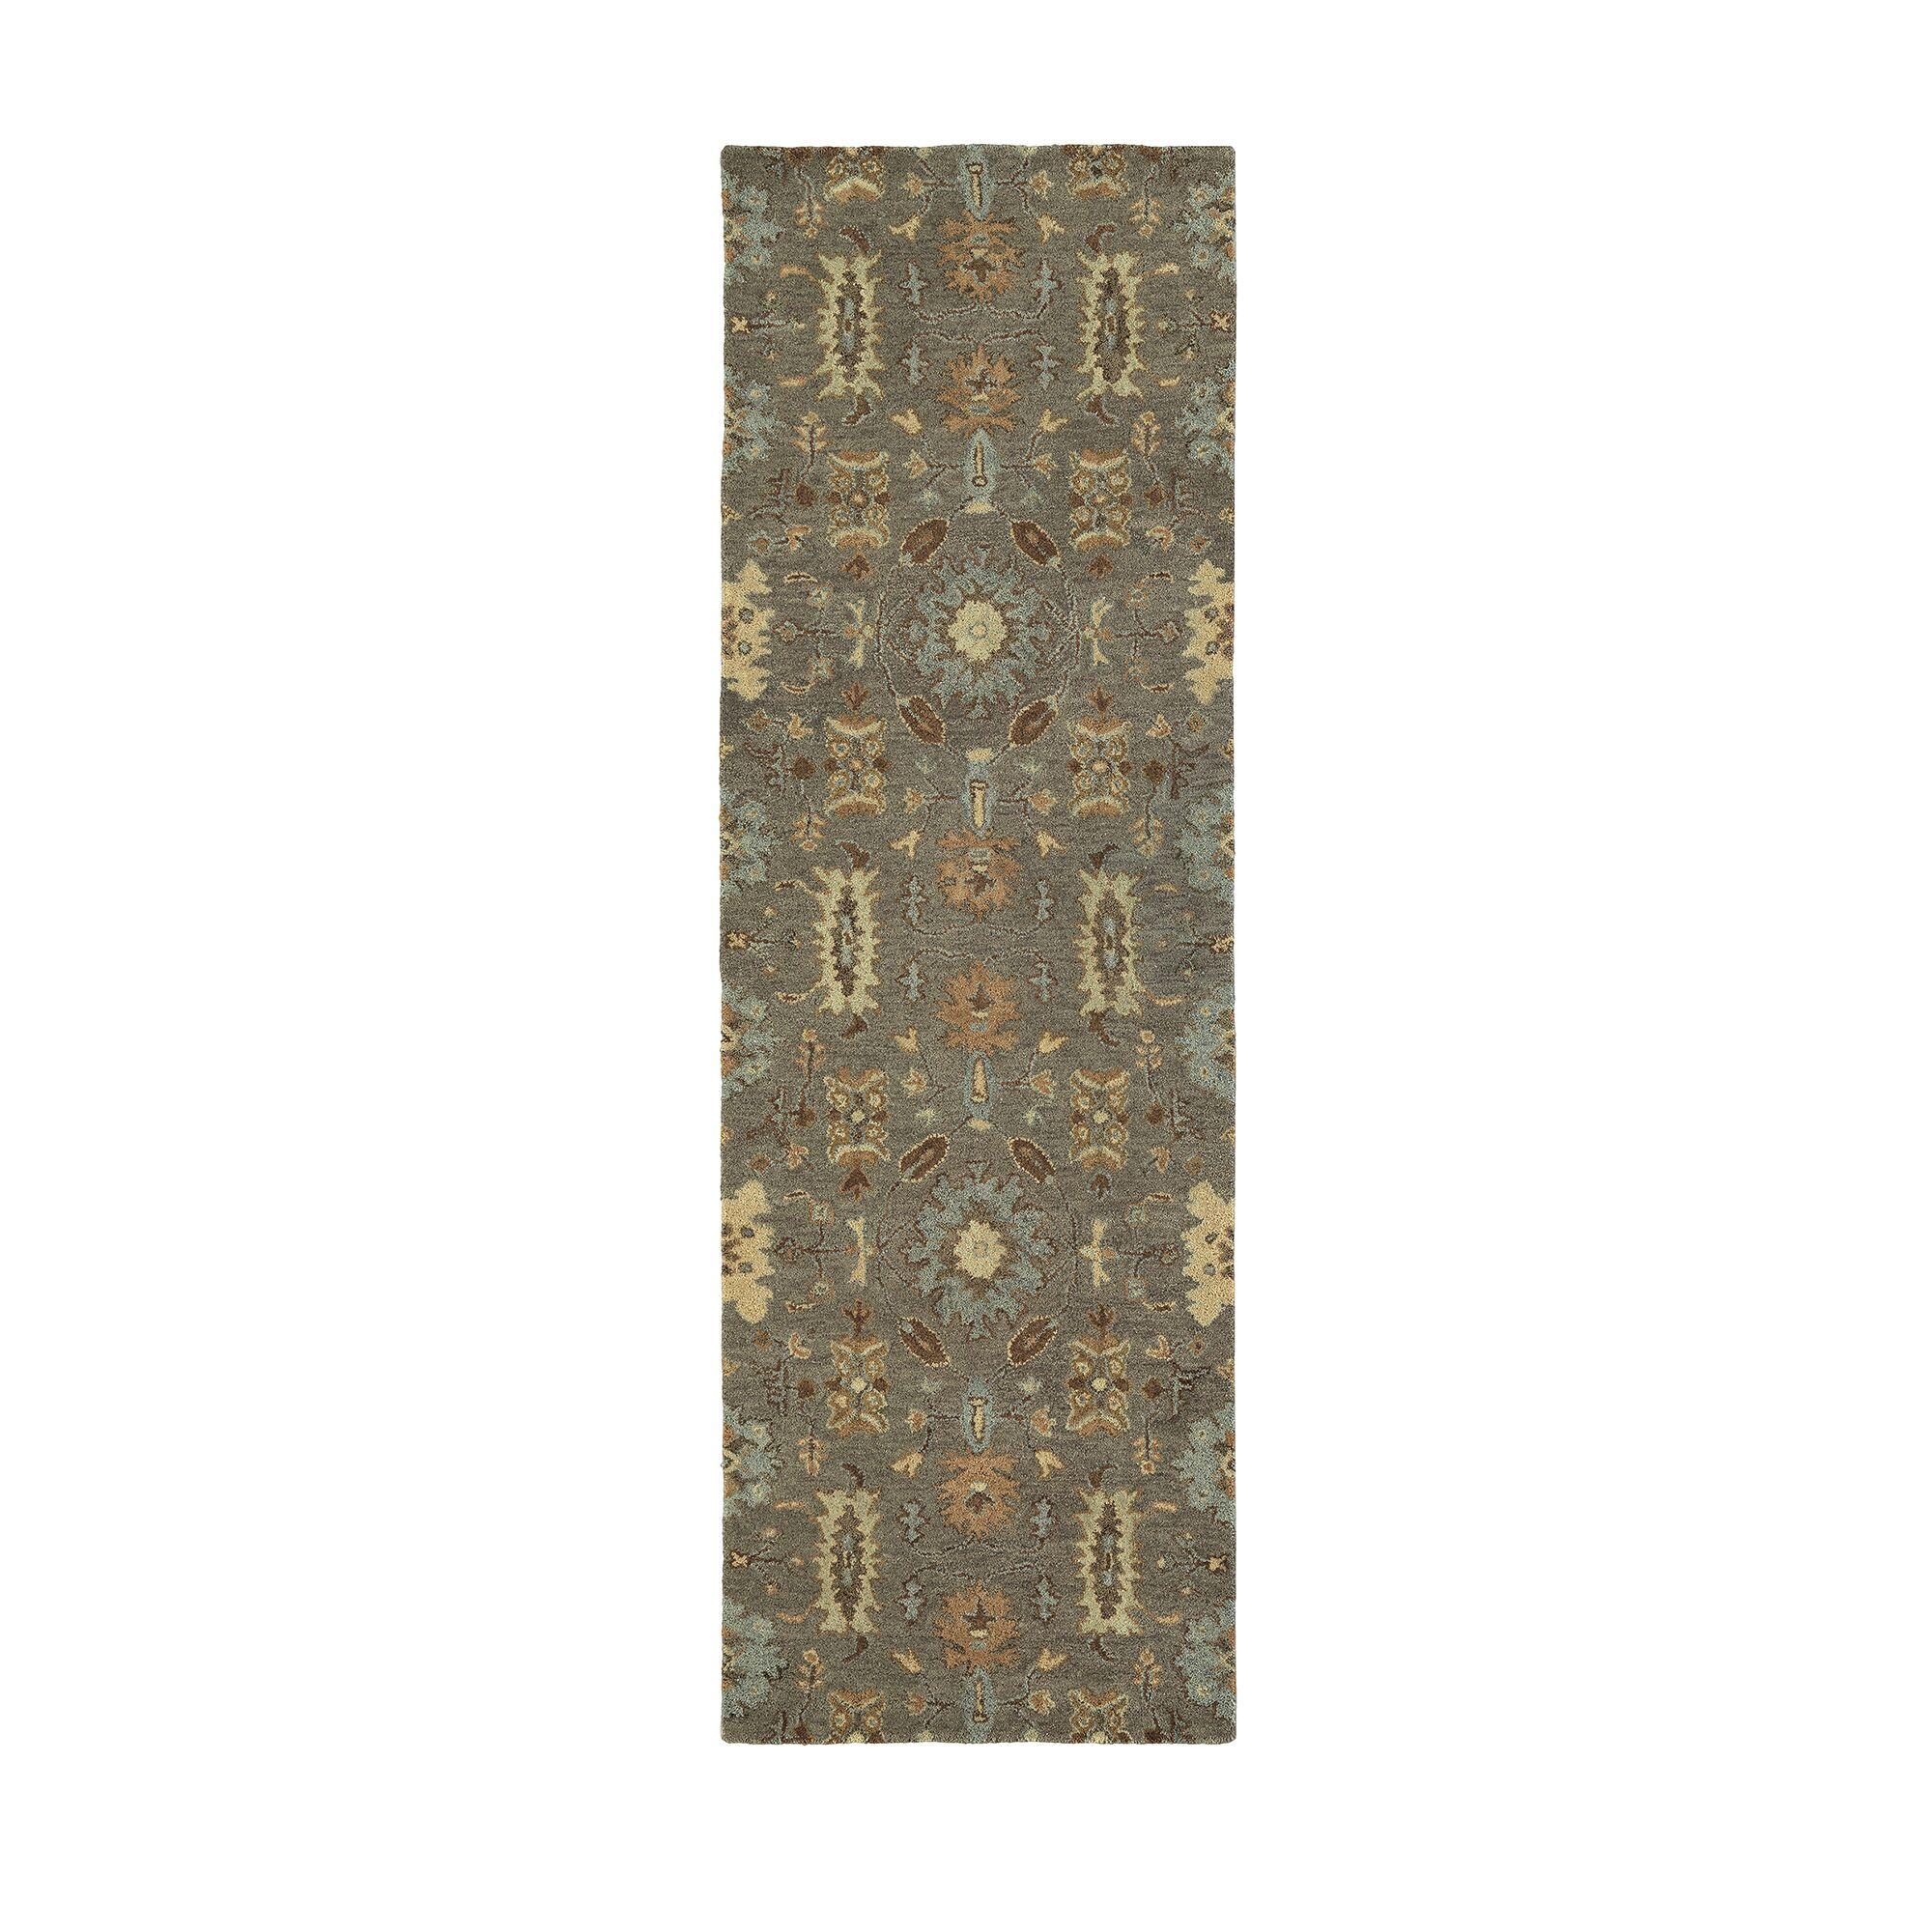 Romarin Hand-Tufted Wool Mushroom Area Rug Rug Size: Runner 2'6